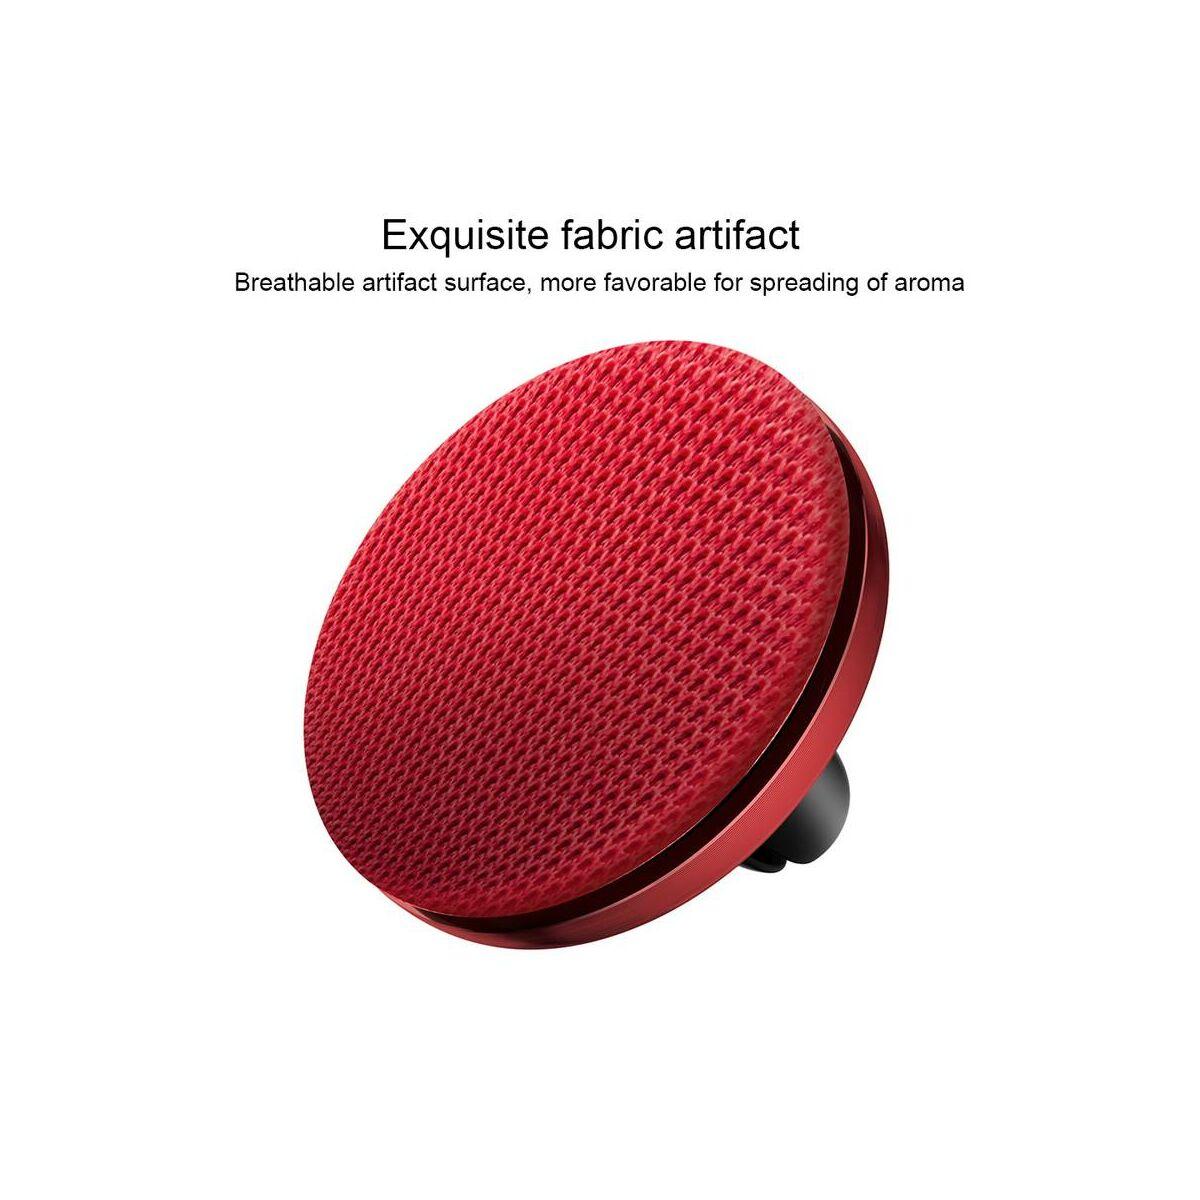 Baseus autós illatosító, Fabric Artifact, piros (SUXUN-BY09)